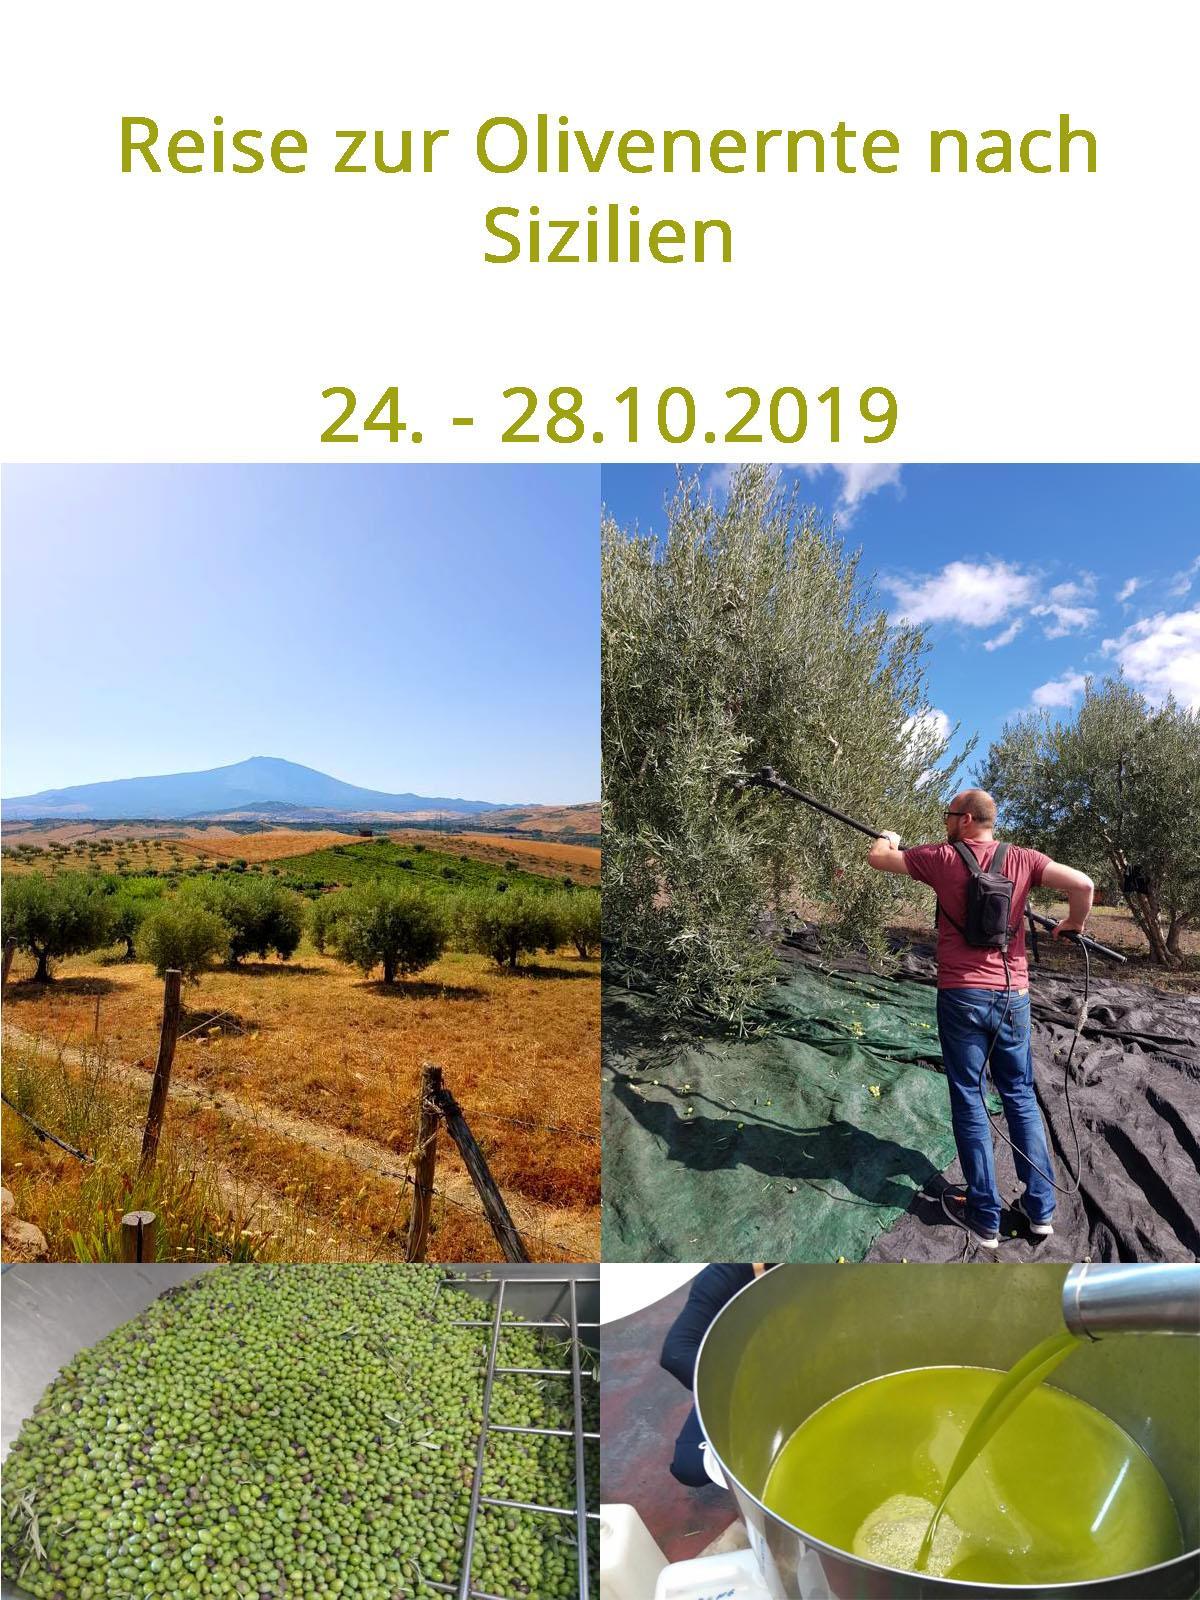 Olivenernte 2019